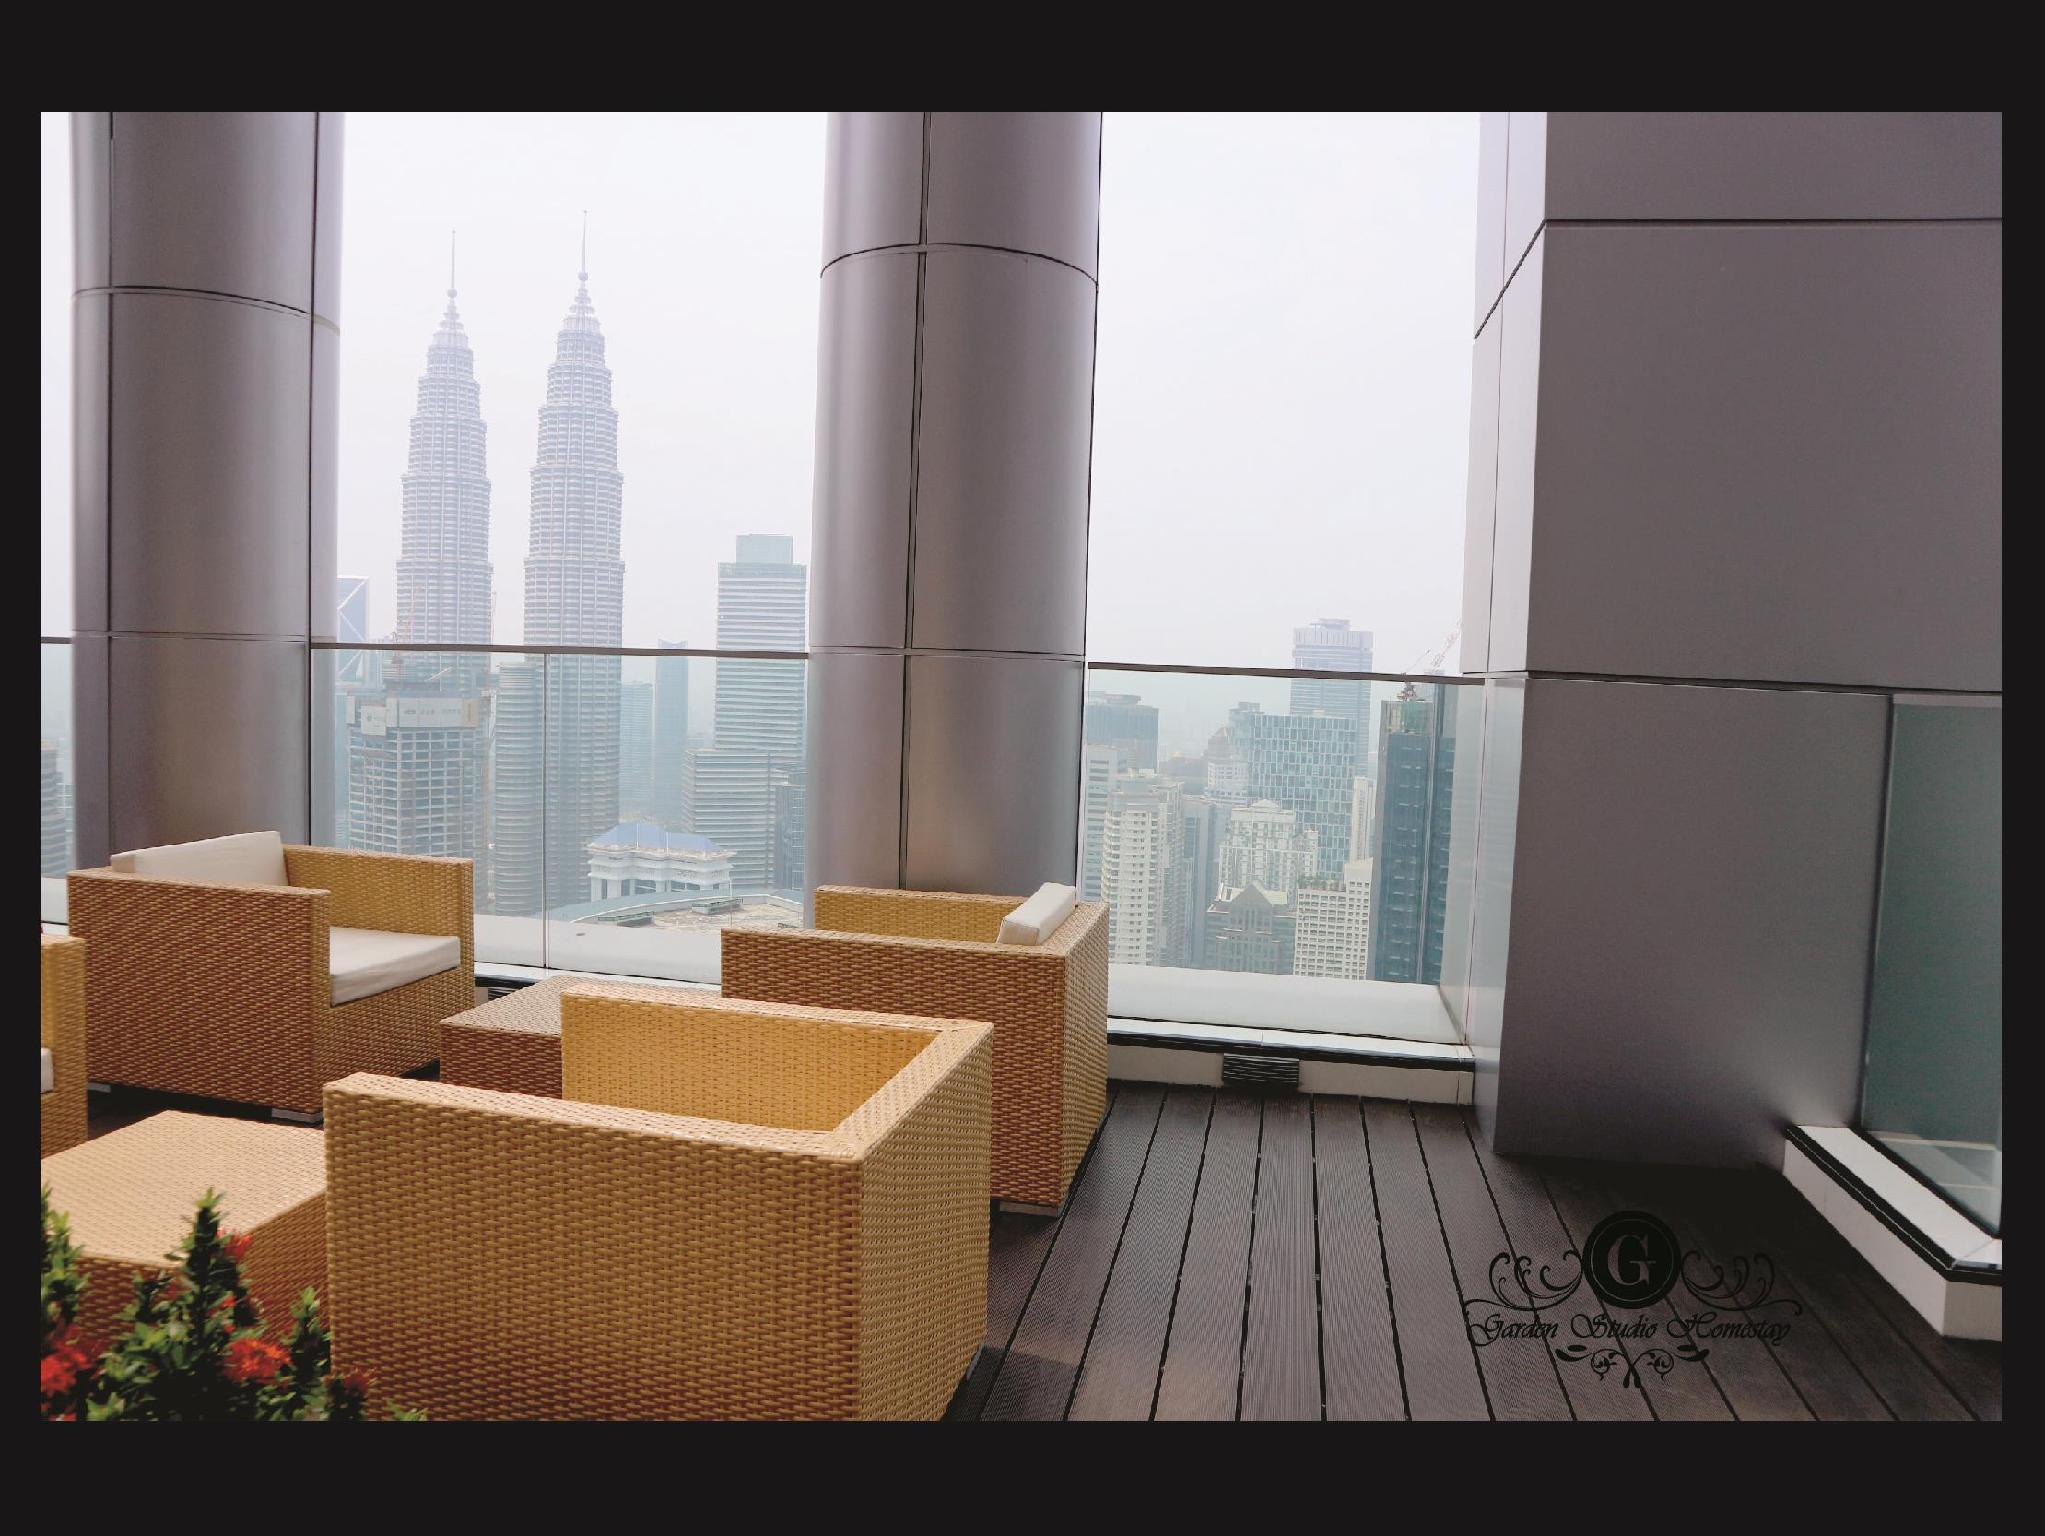 Garden Studio Kl Kuala Lumpur Malaysia